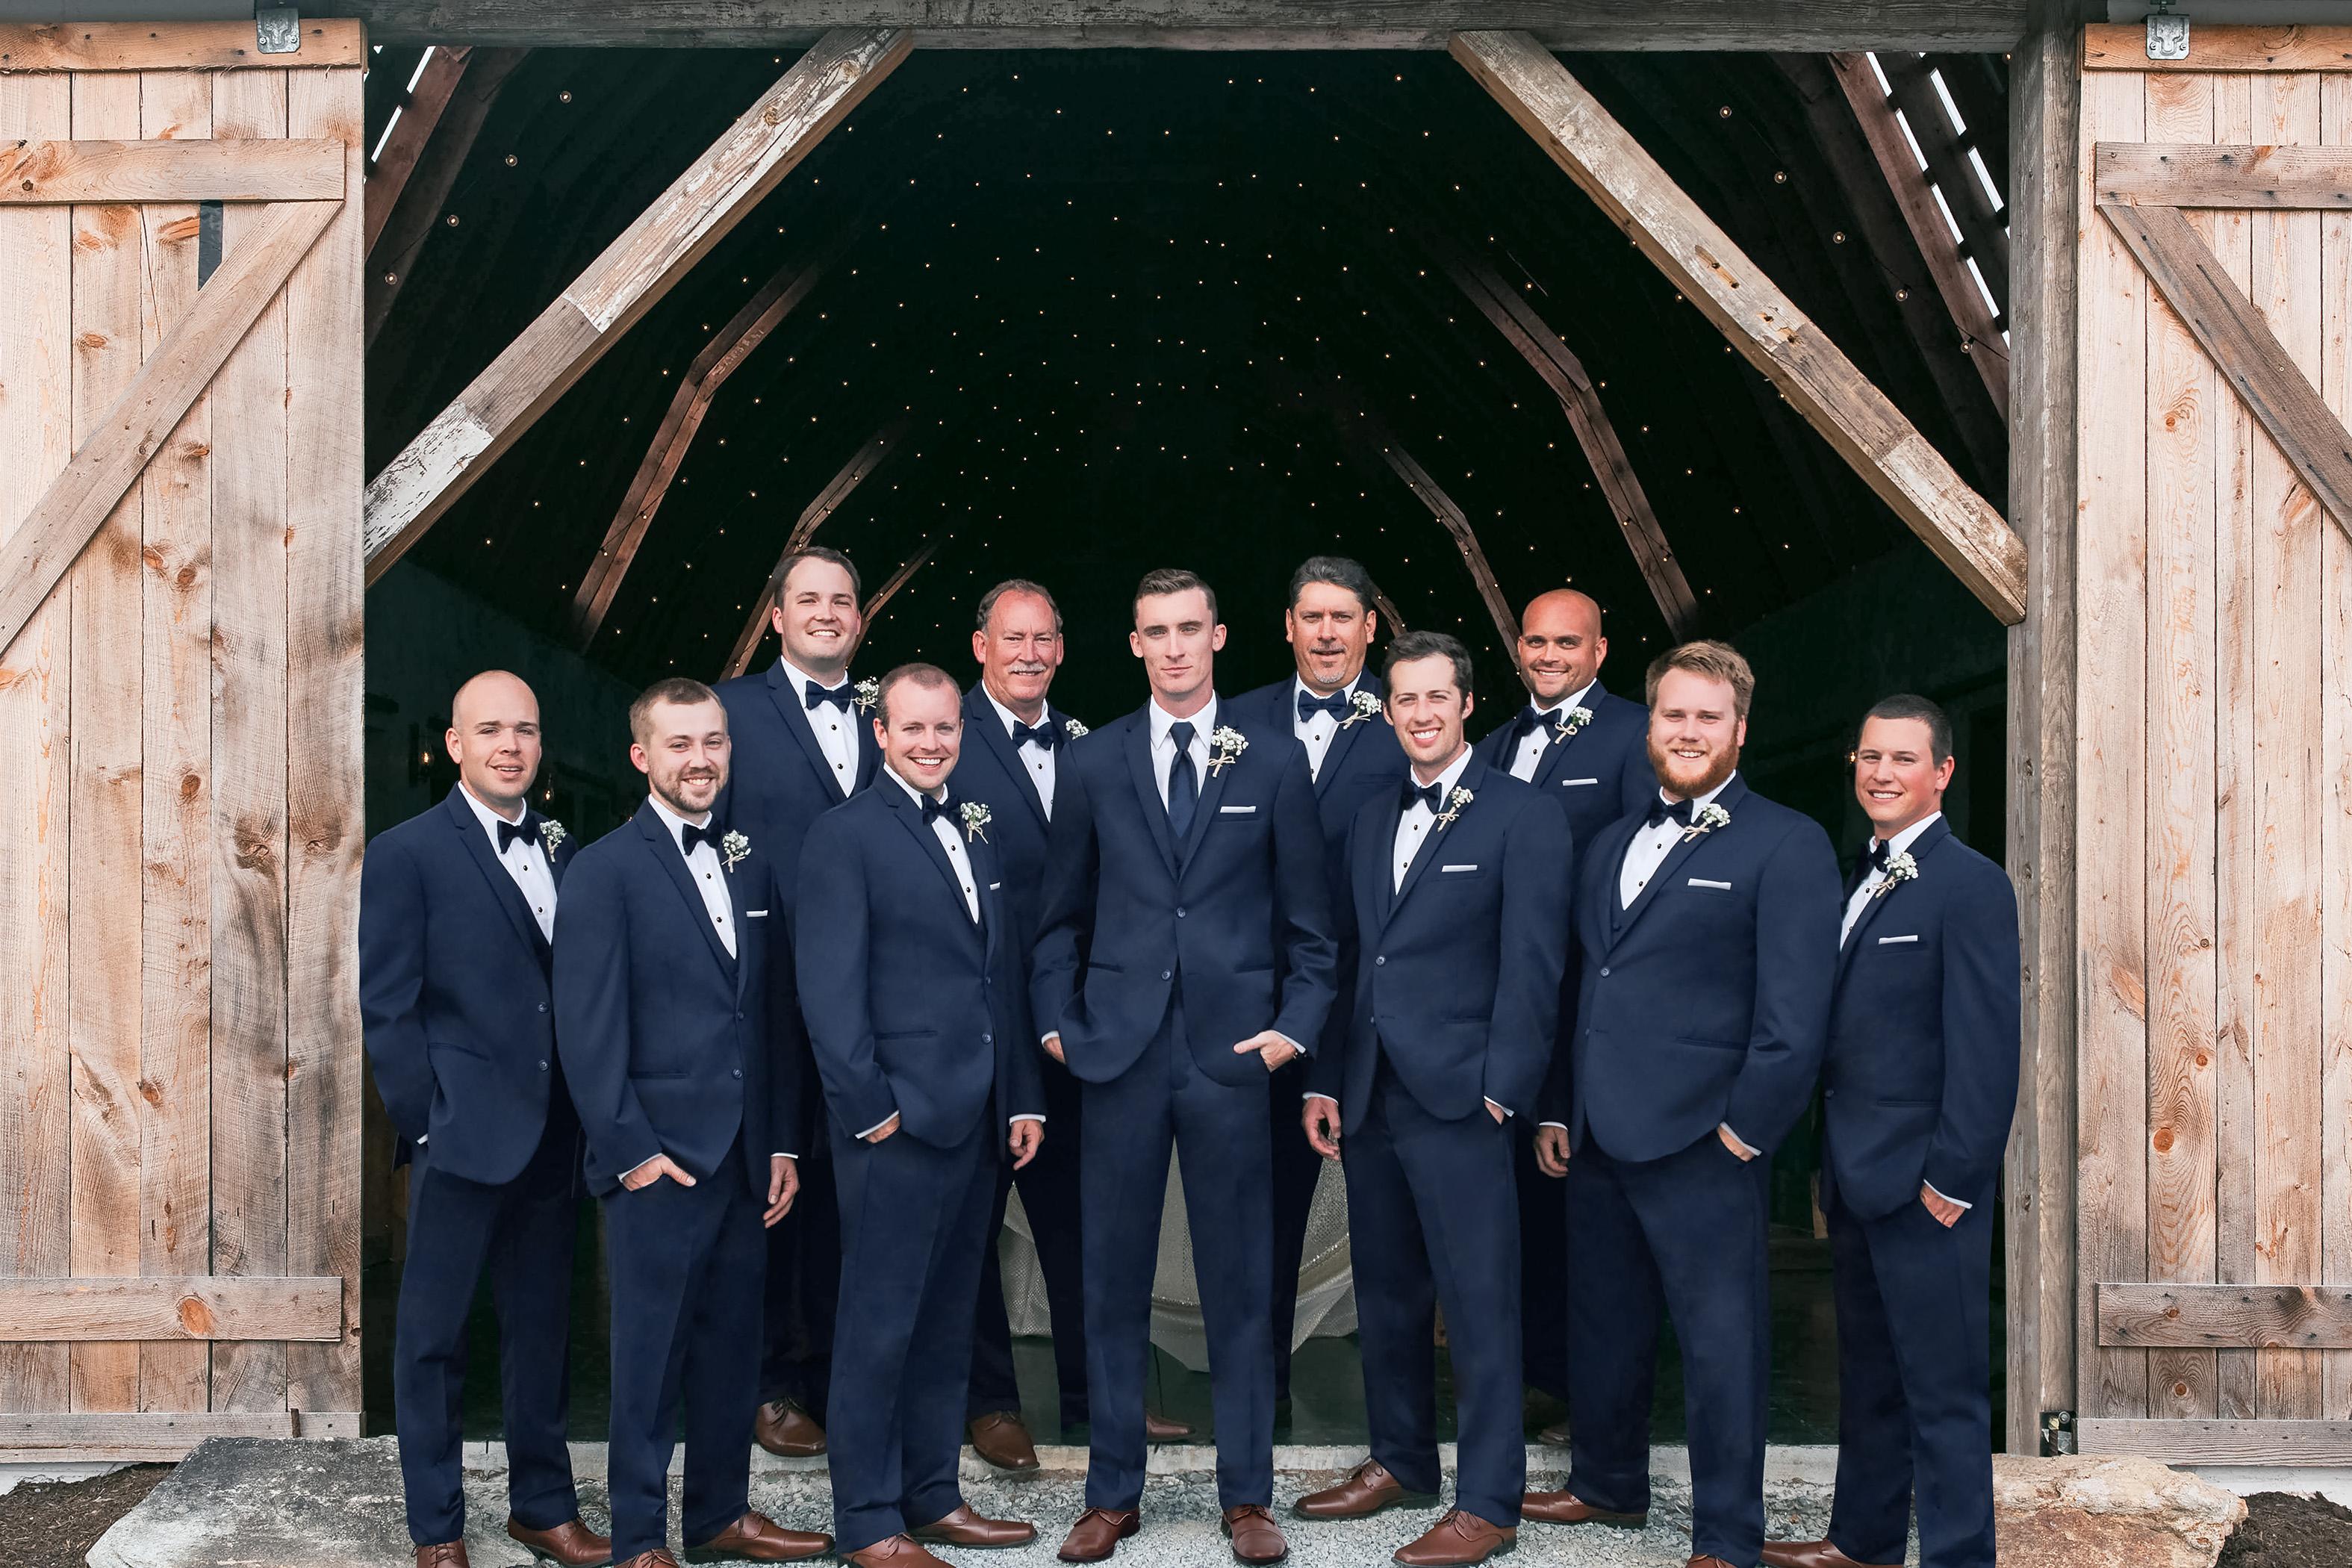 how to order groomsmen tuxedos - groomsmen posing in blue suits